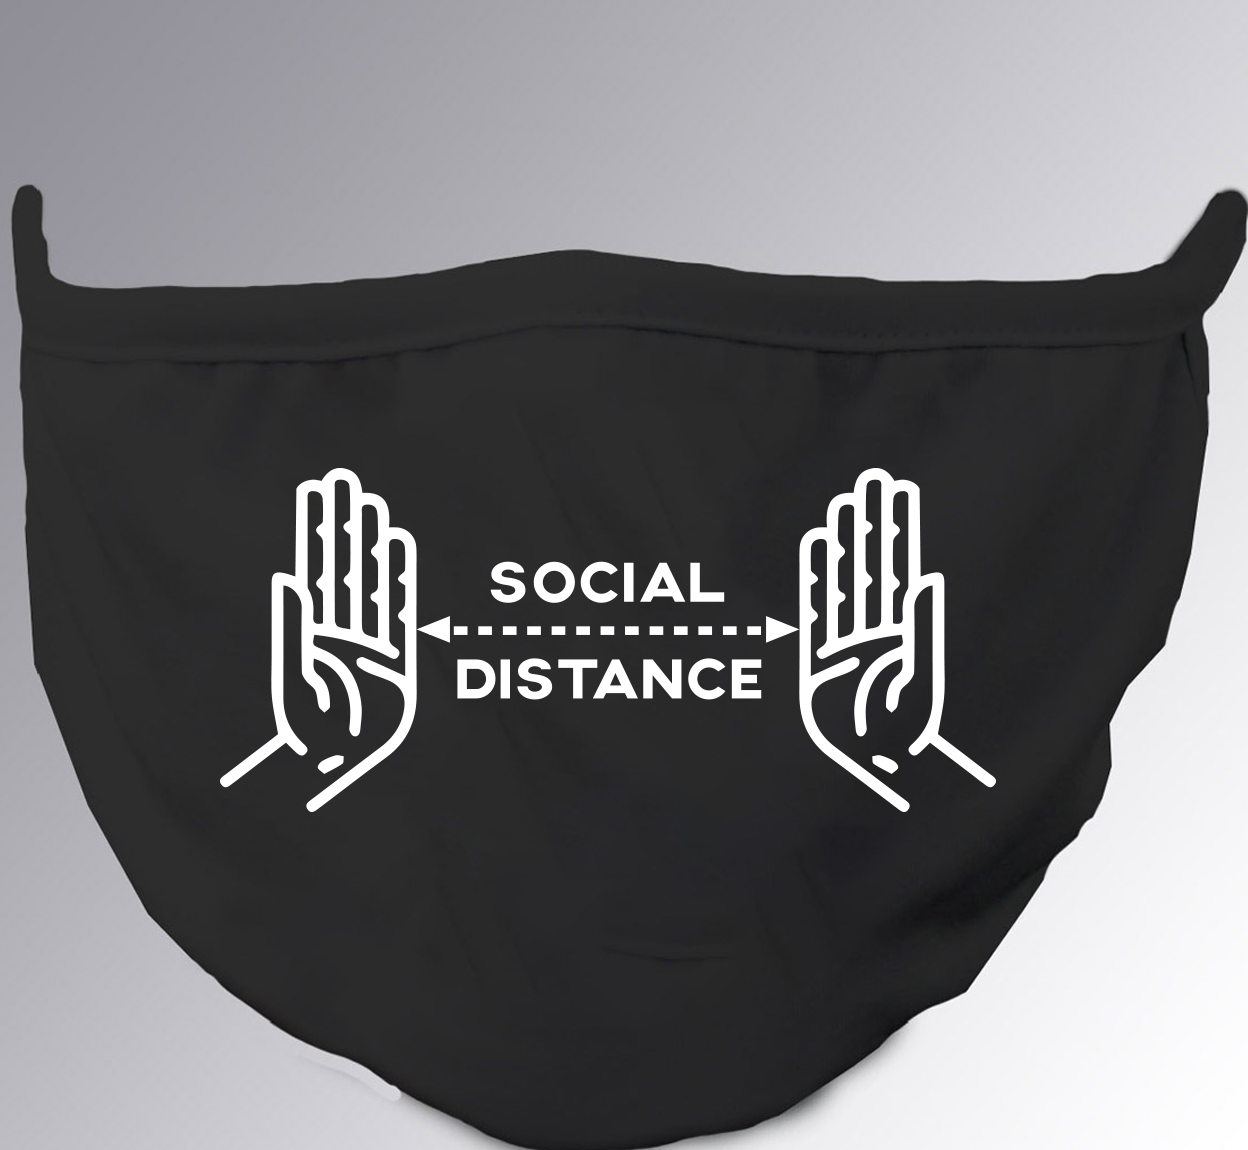 Social Distance_Black